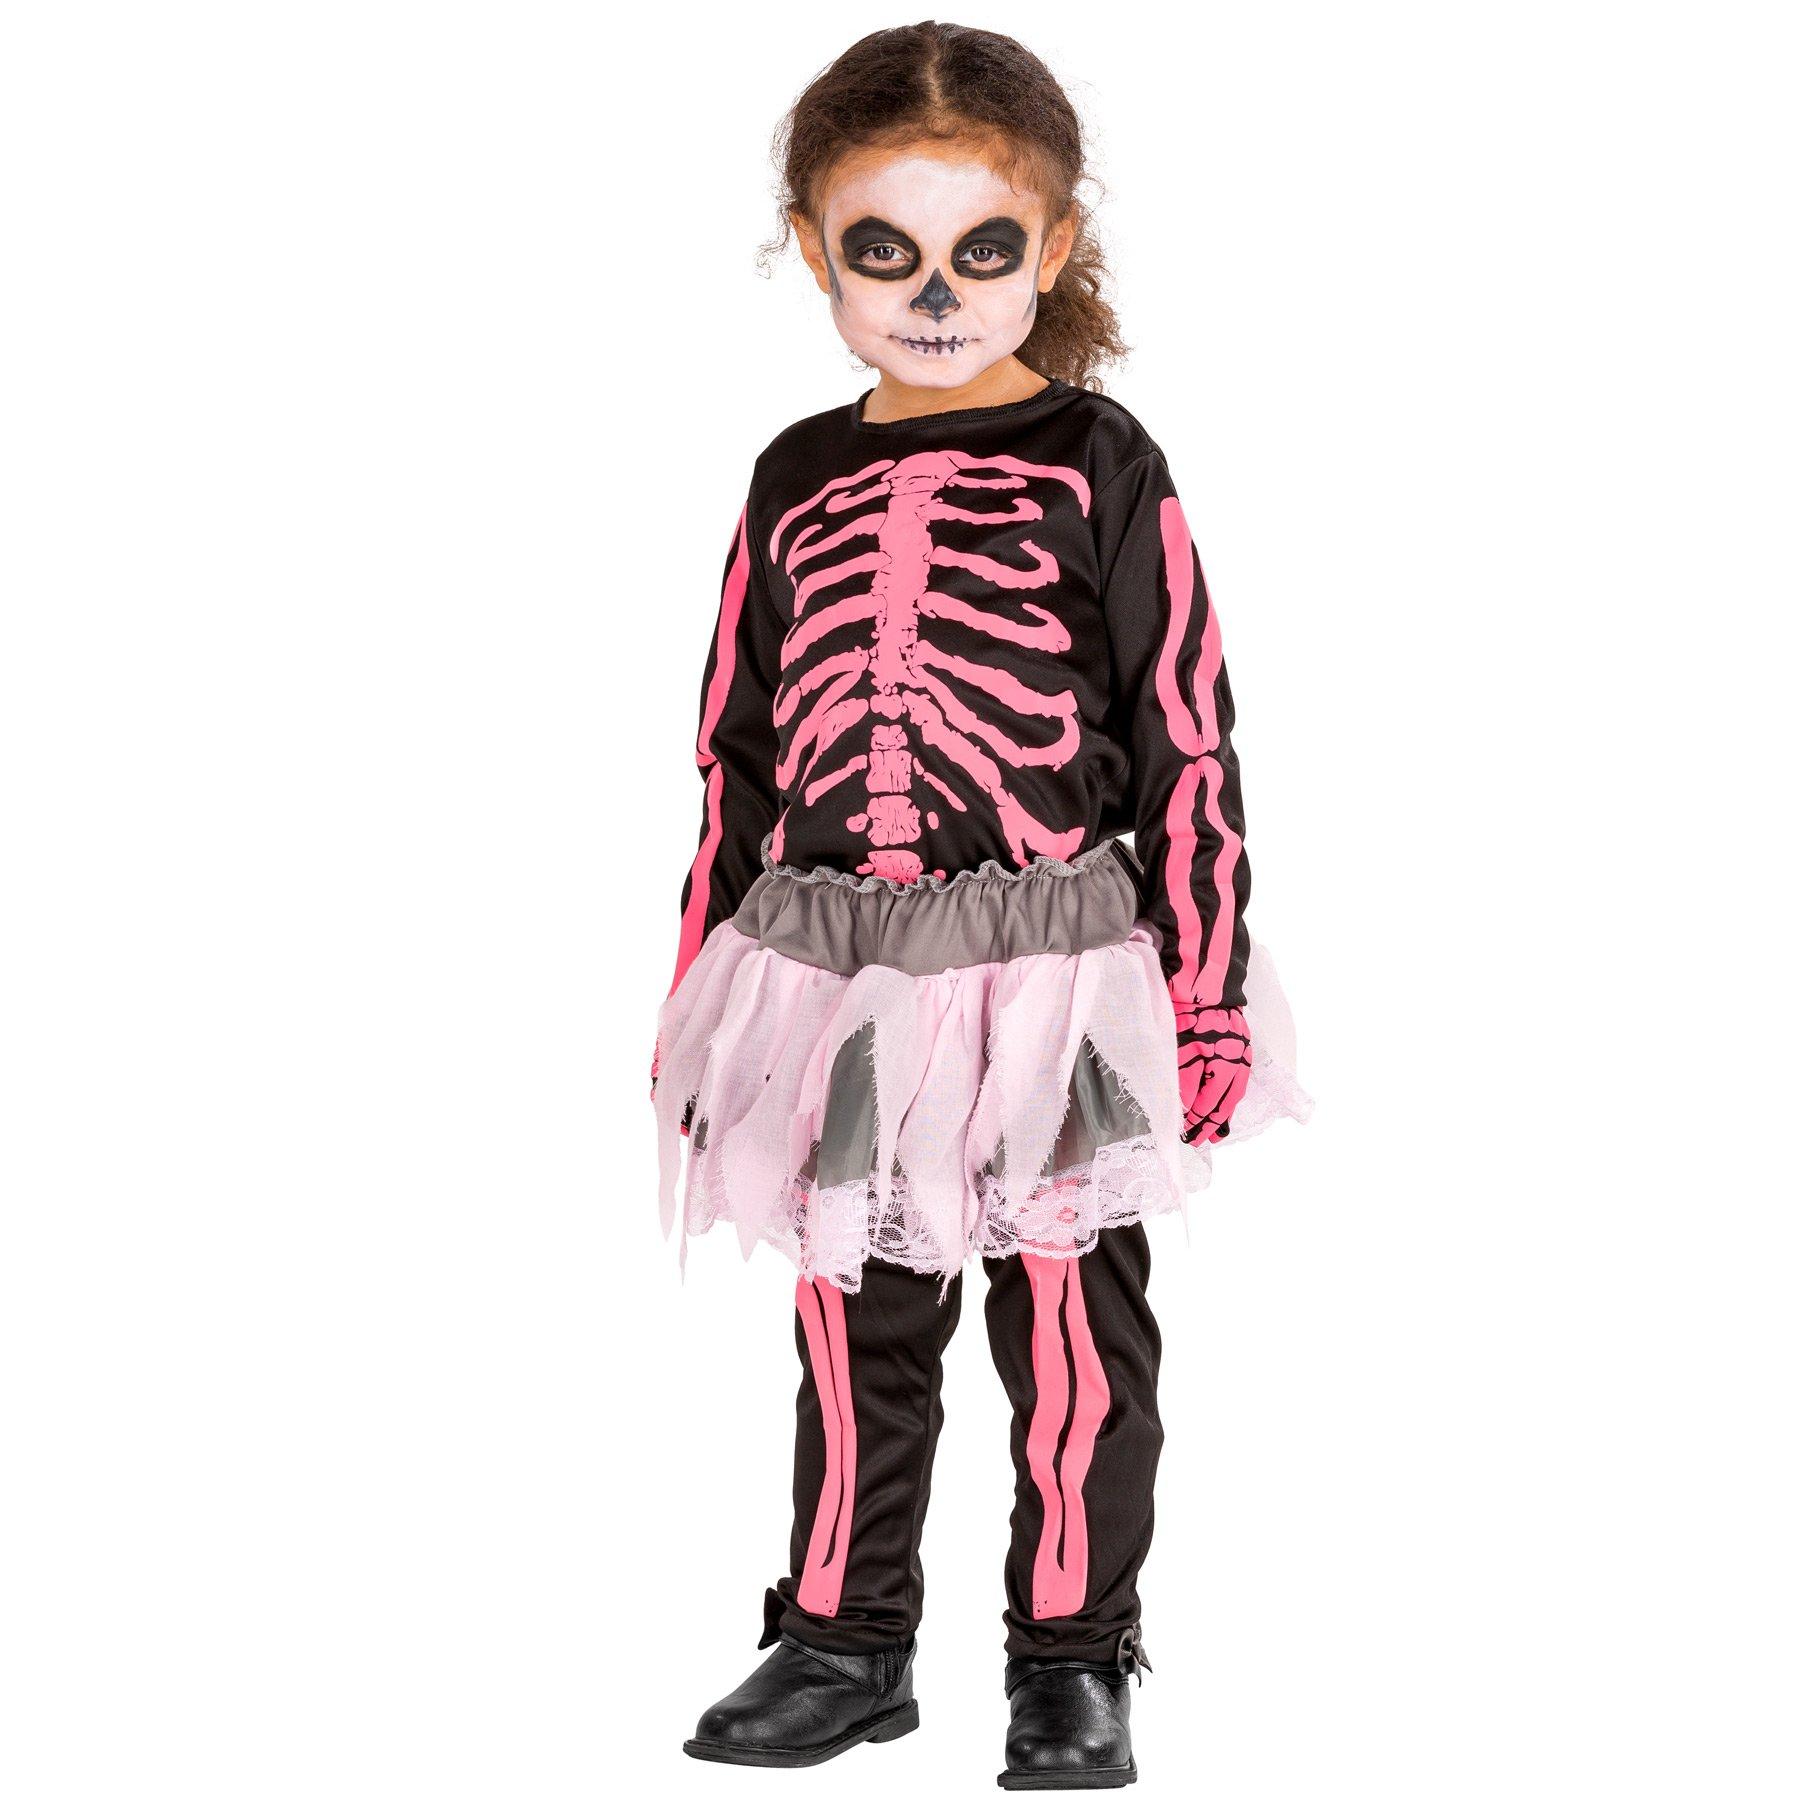 PINK SKELETON GIRL CHILD HALLOWEEN COSTUME GIRLS SIZE SMALL 4-6